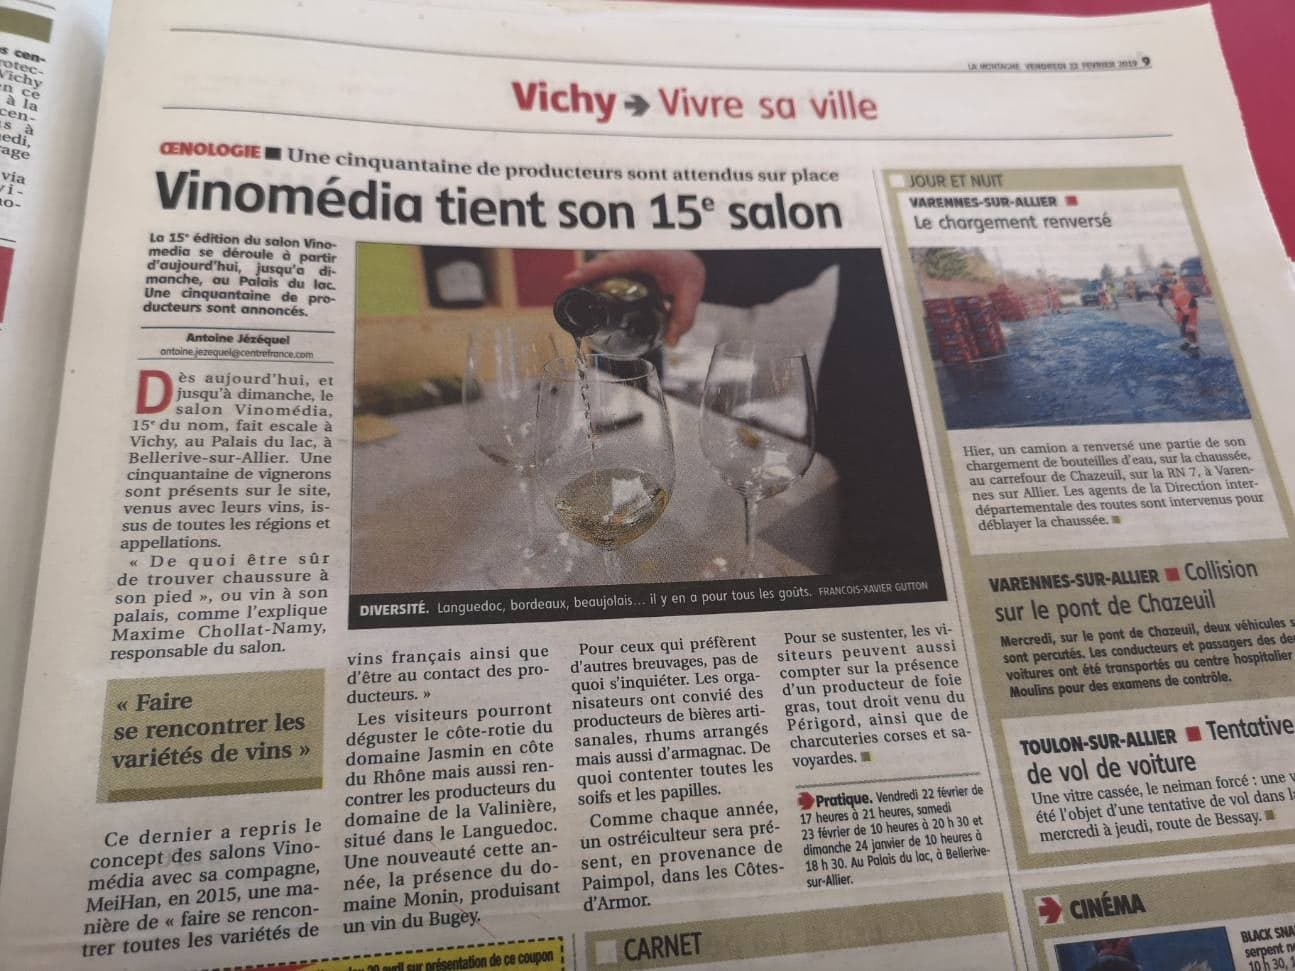 salon du vin vinomedia de vichy dans la presse